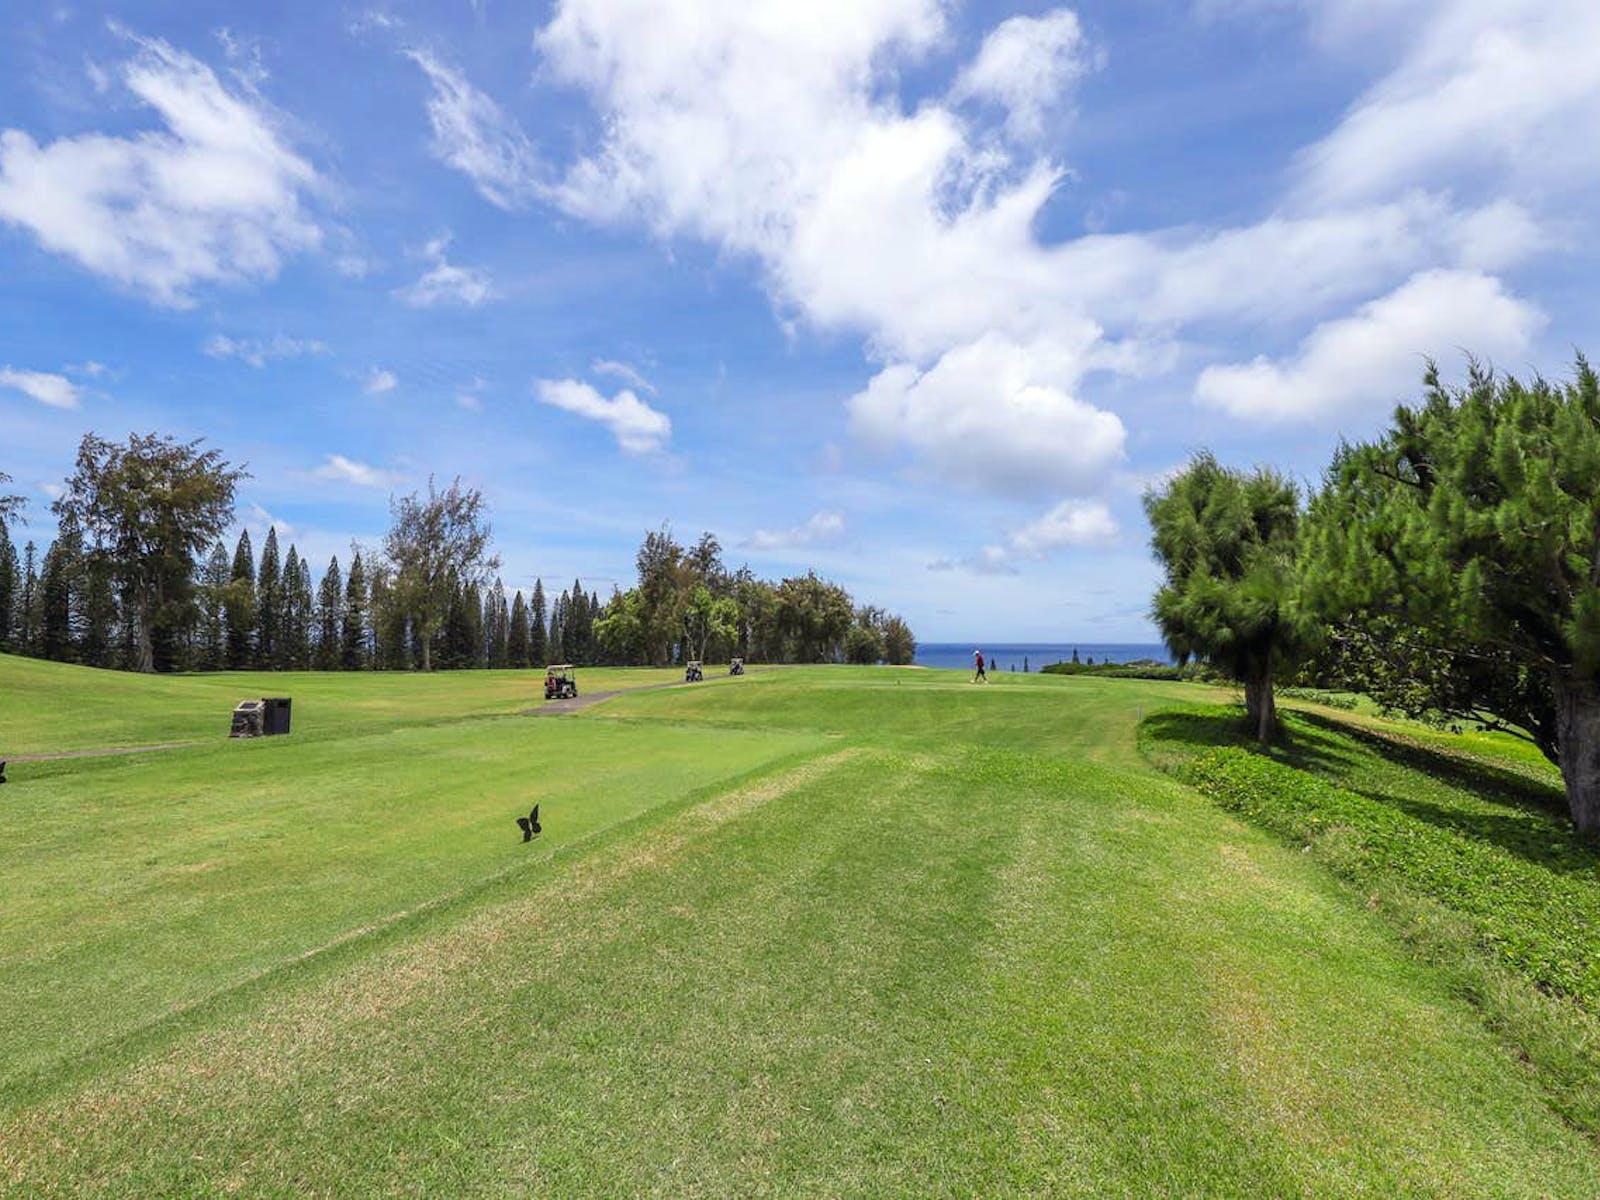 Lahaina, HI Kapalua golf course